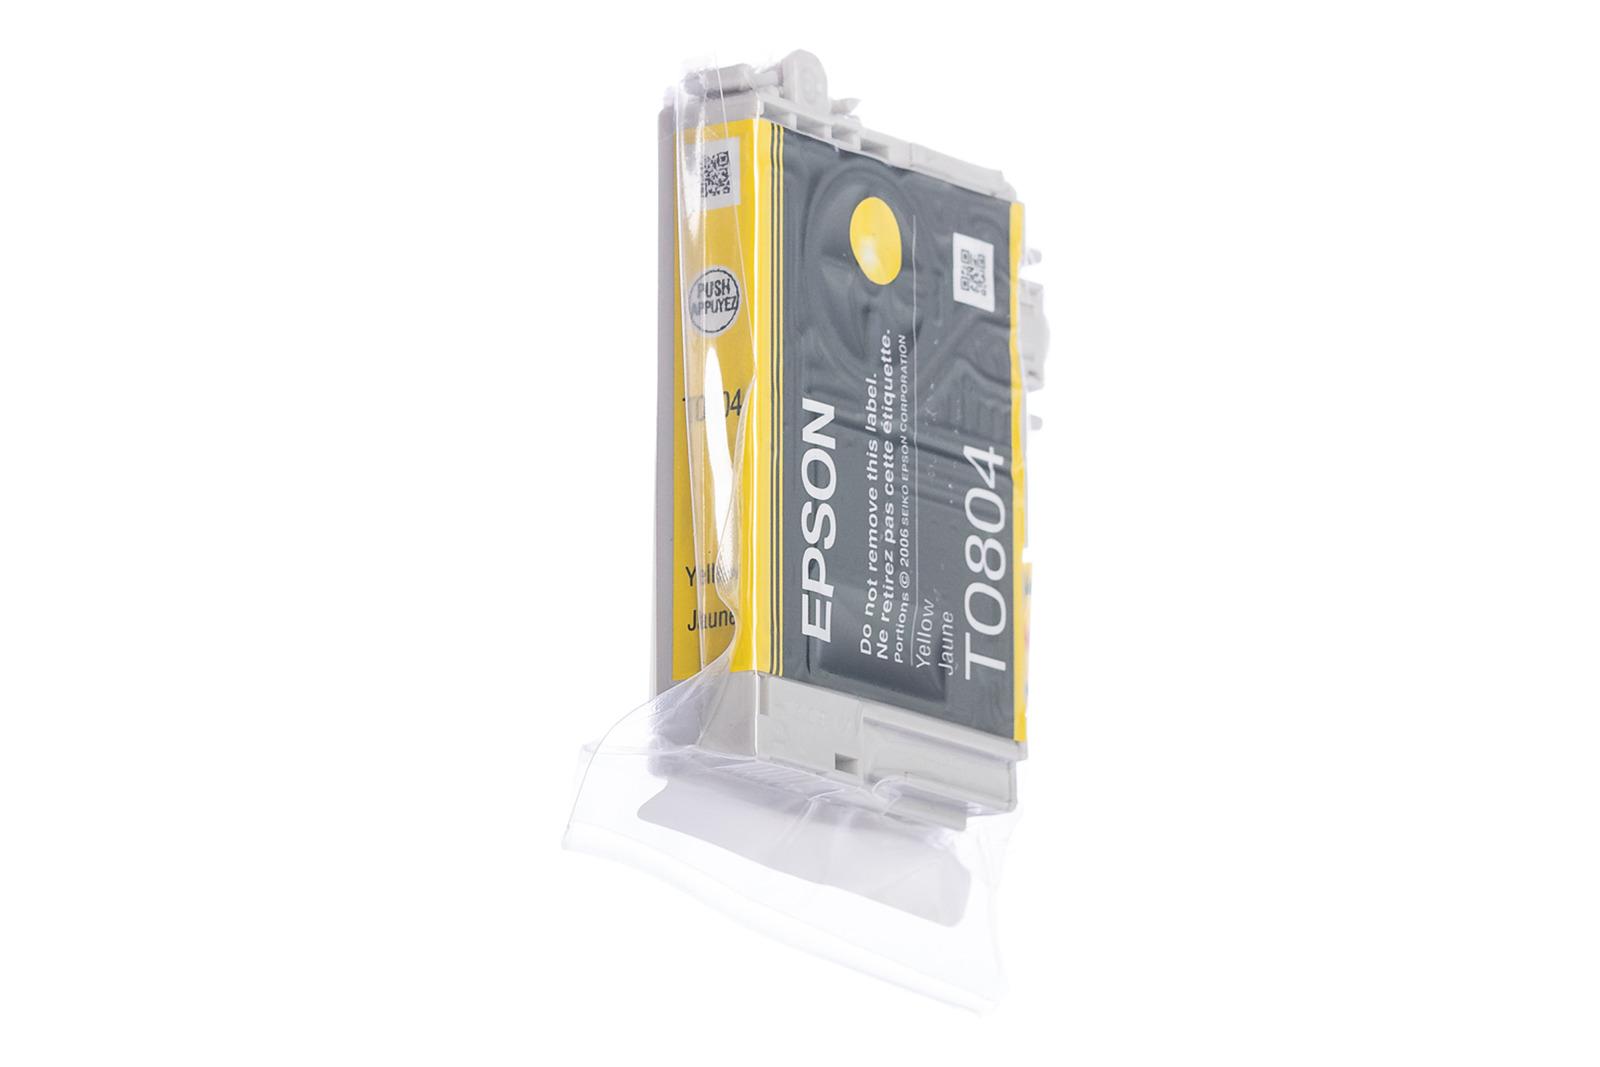 Genuine Ink Cartridge Epson T0804 C13T080440 Yellow